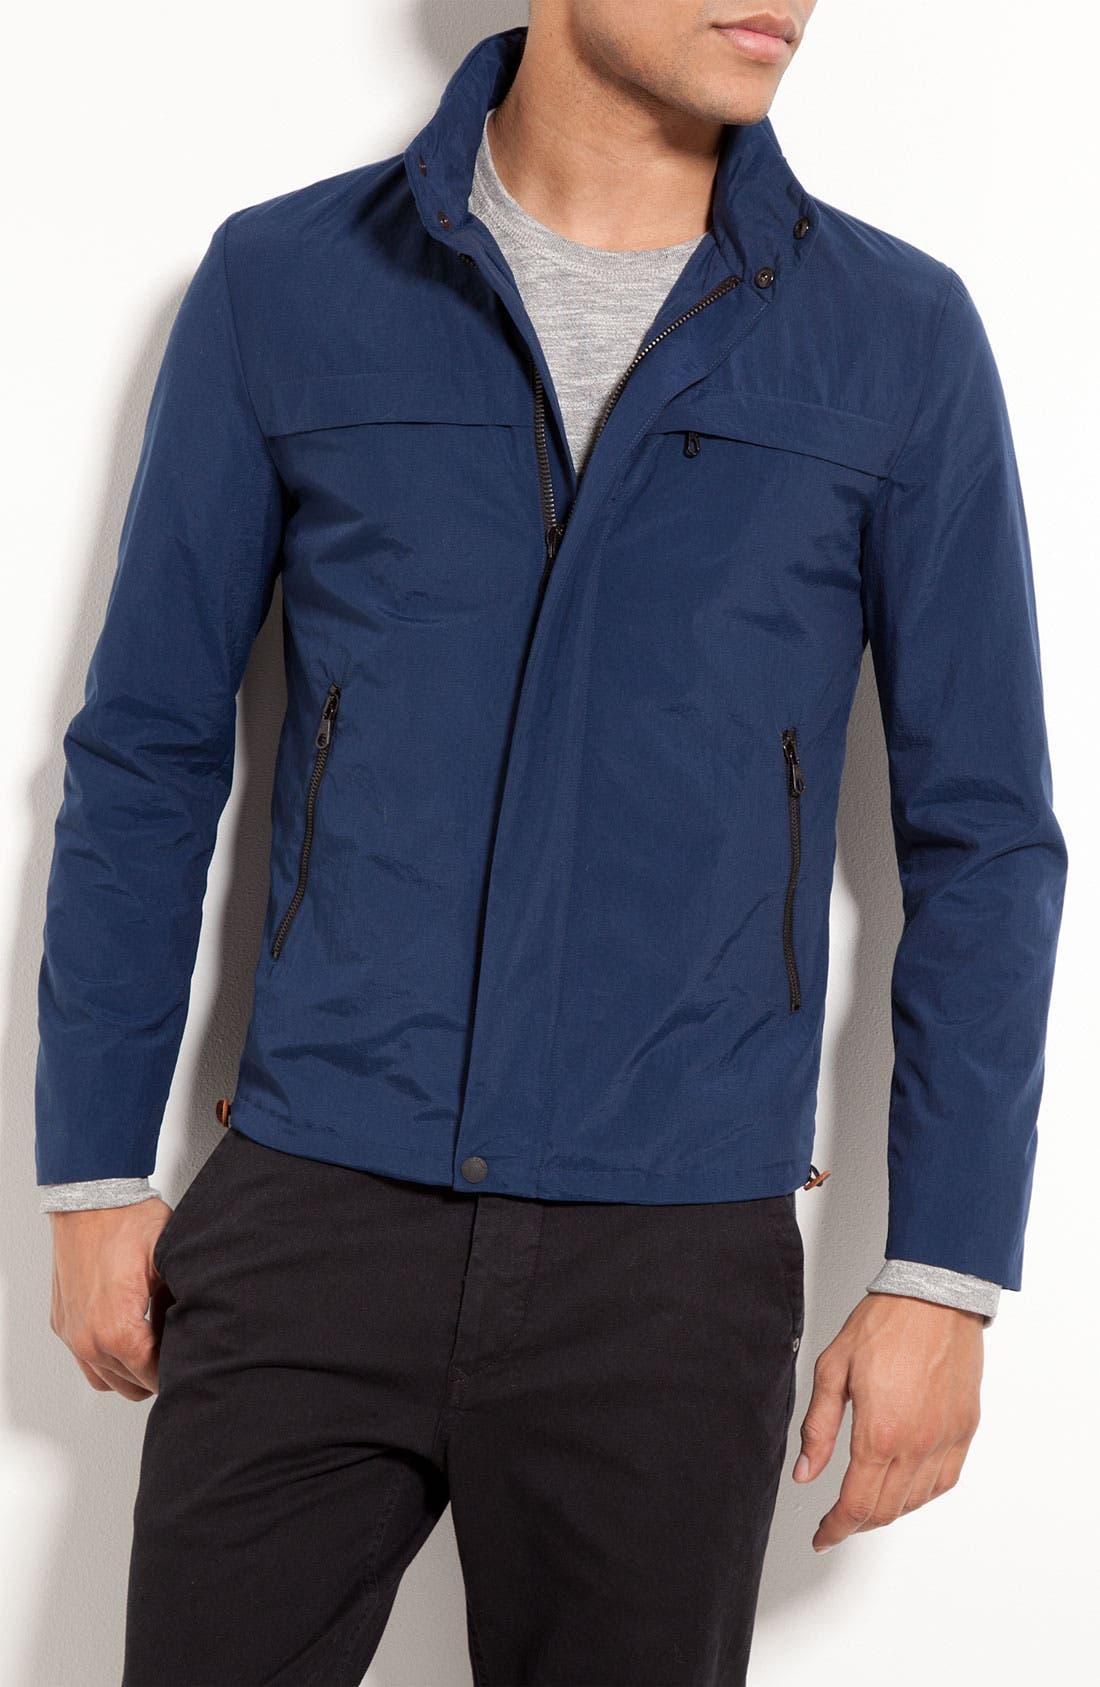 RAG & BONE,                             'Yorke' Jacket,                             Main thumbnail 1, color,                             402